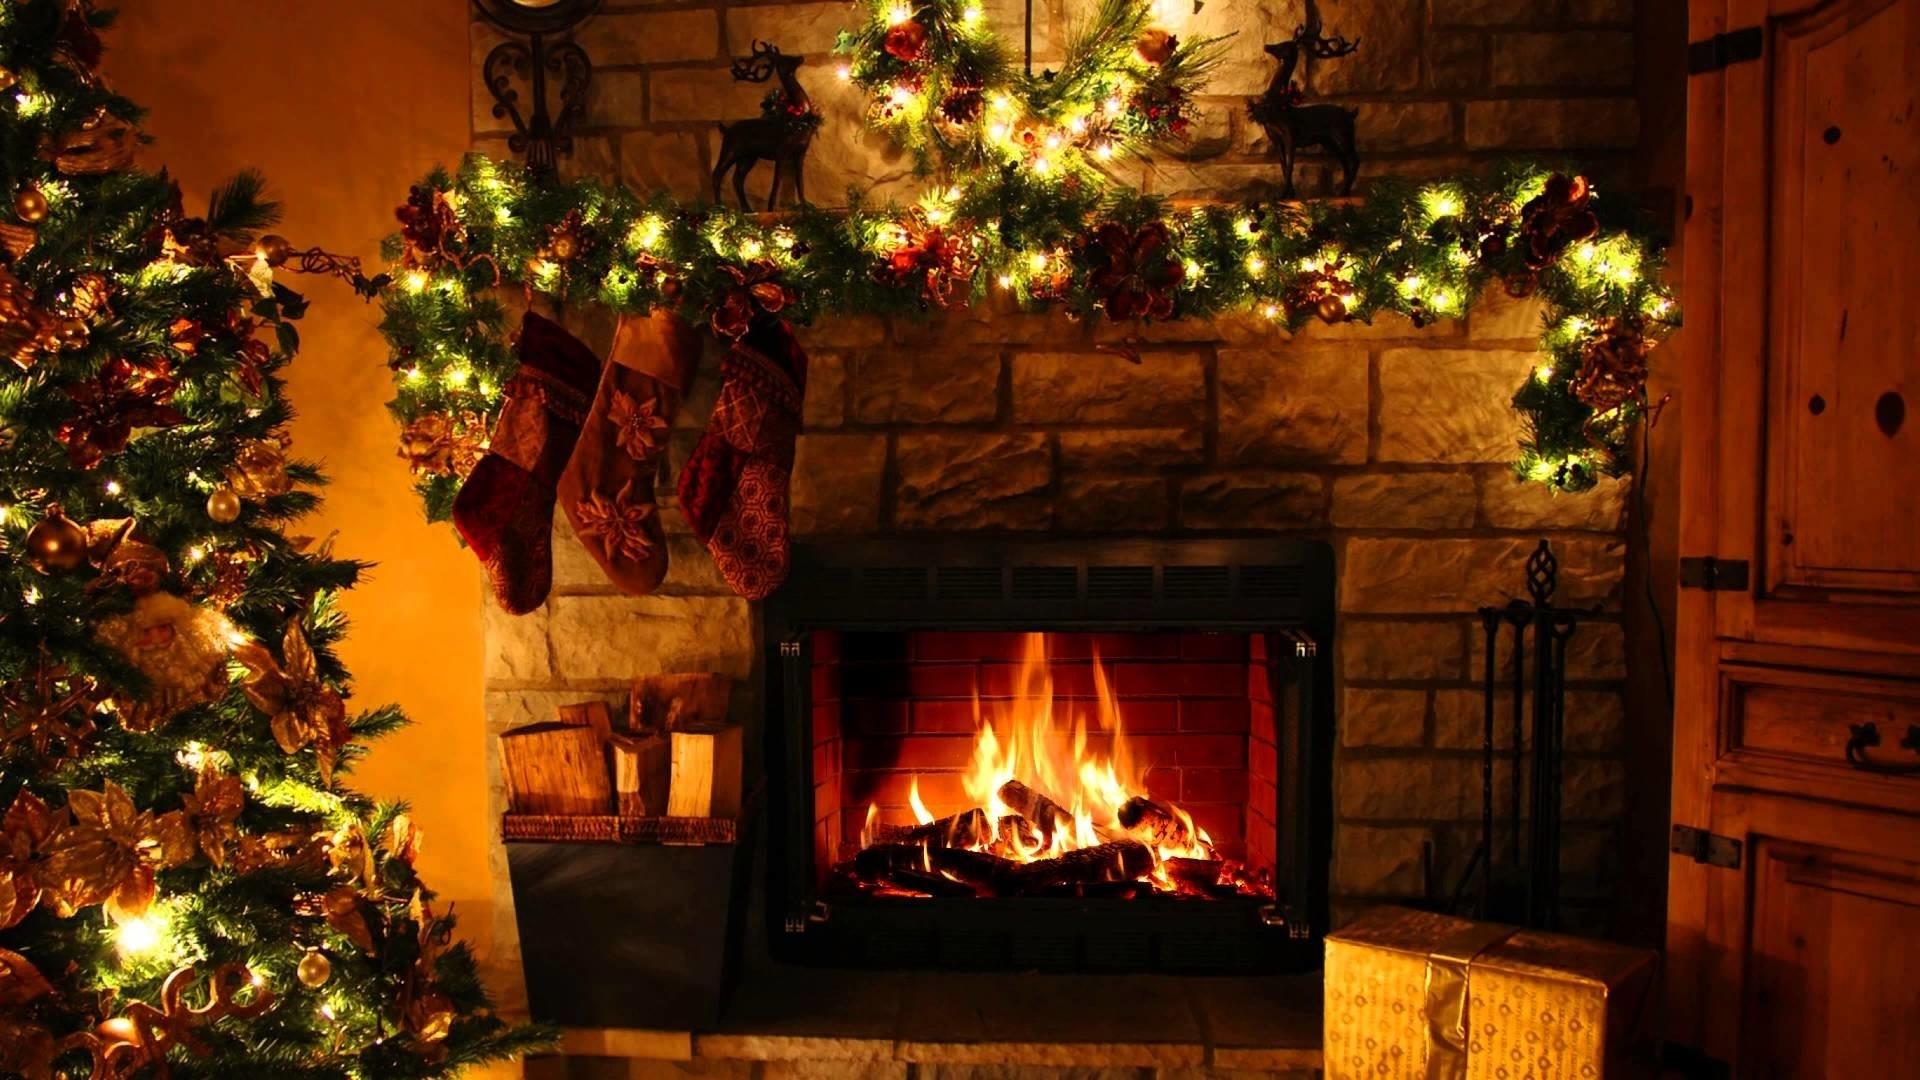 Fireplace hd desktop wallpaper